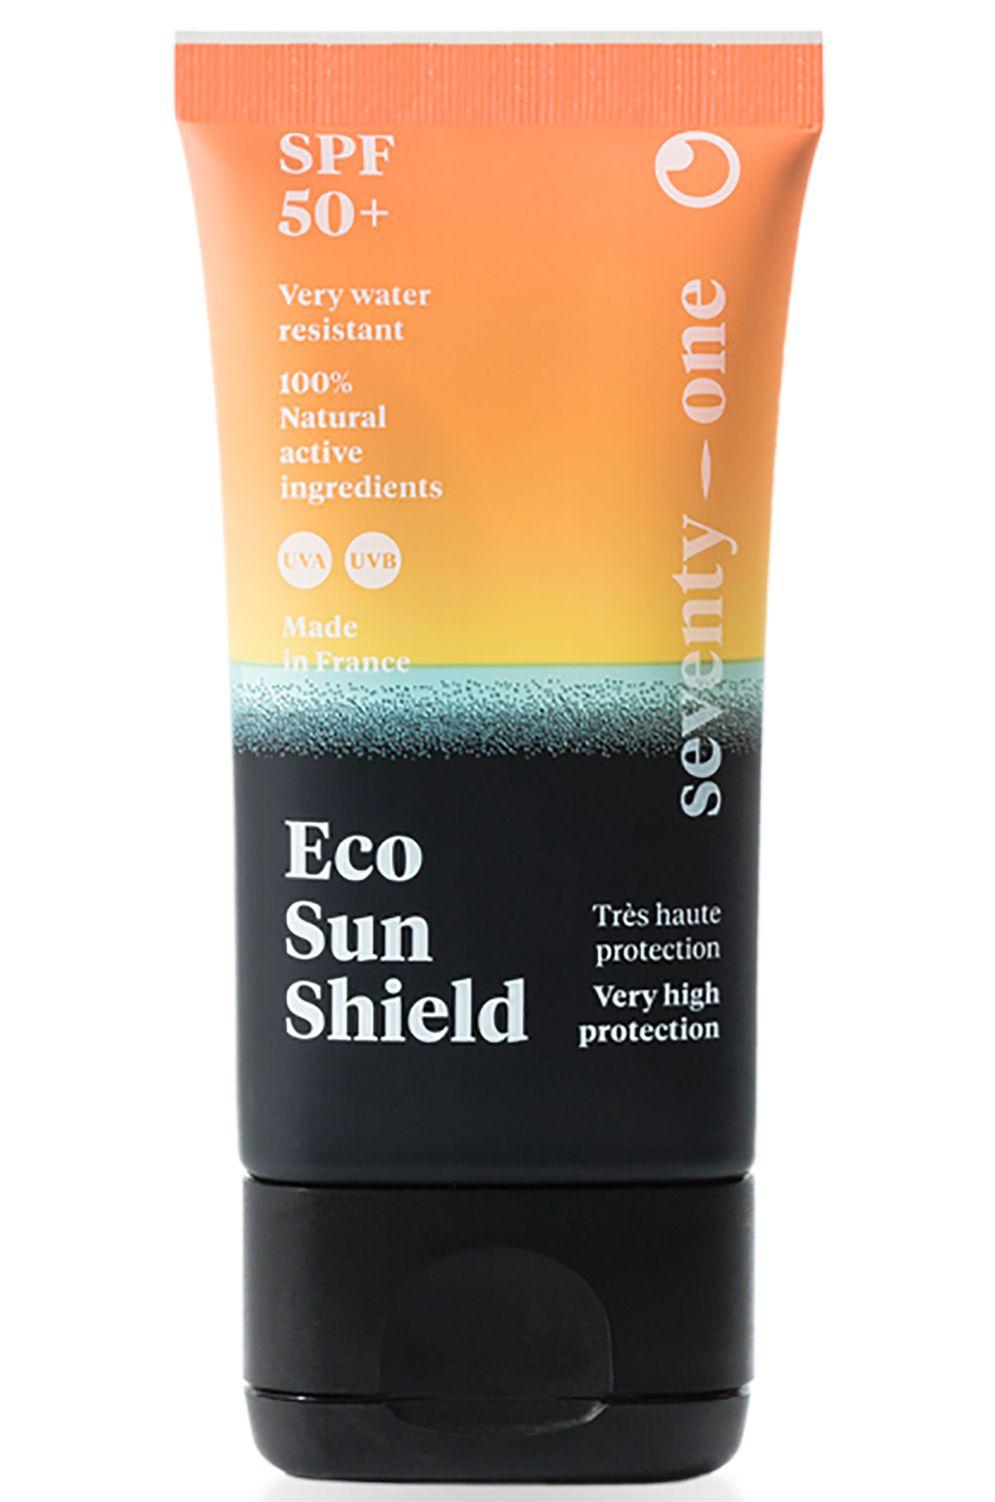 Seventy One Percent Sunscreen ECO SUN SHIELD - SPORT - SPF 50+ Assorted